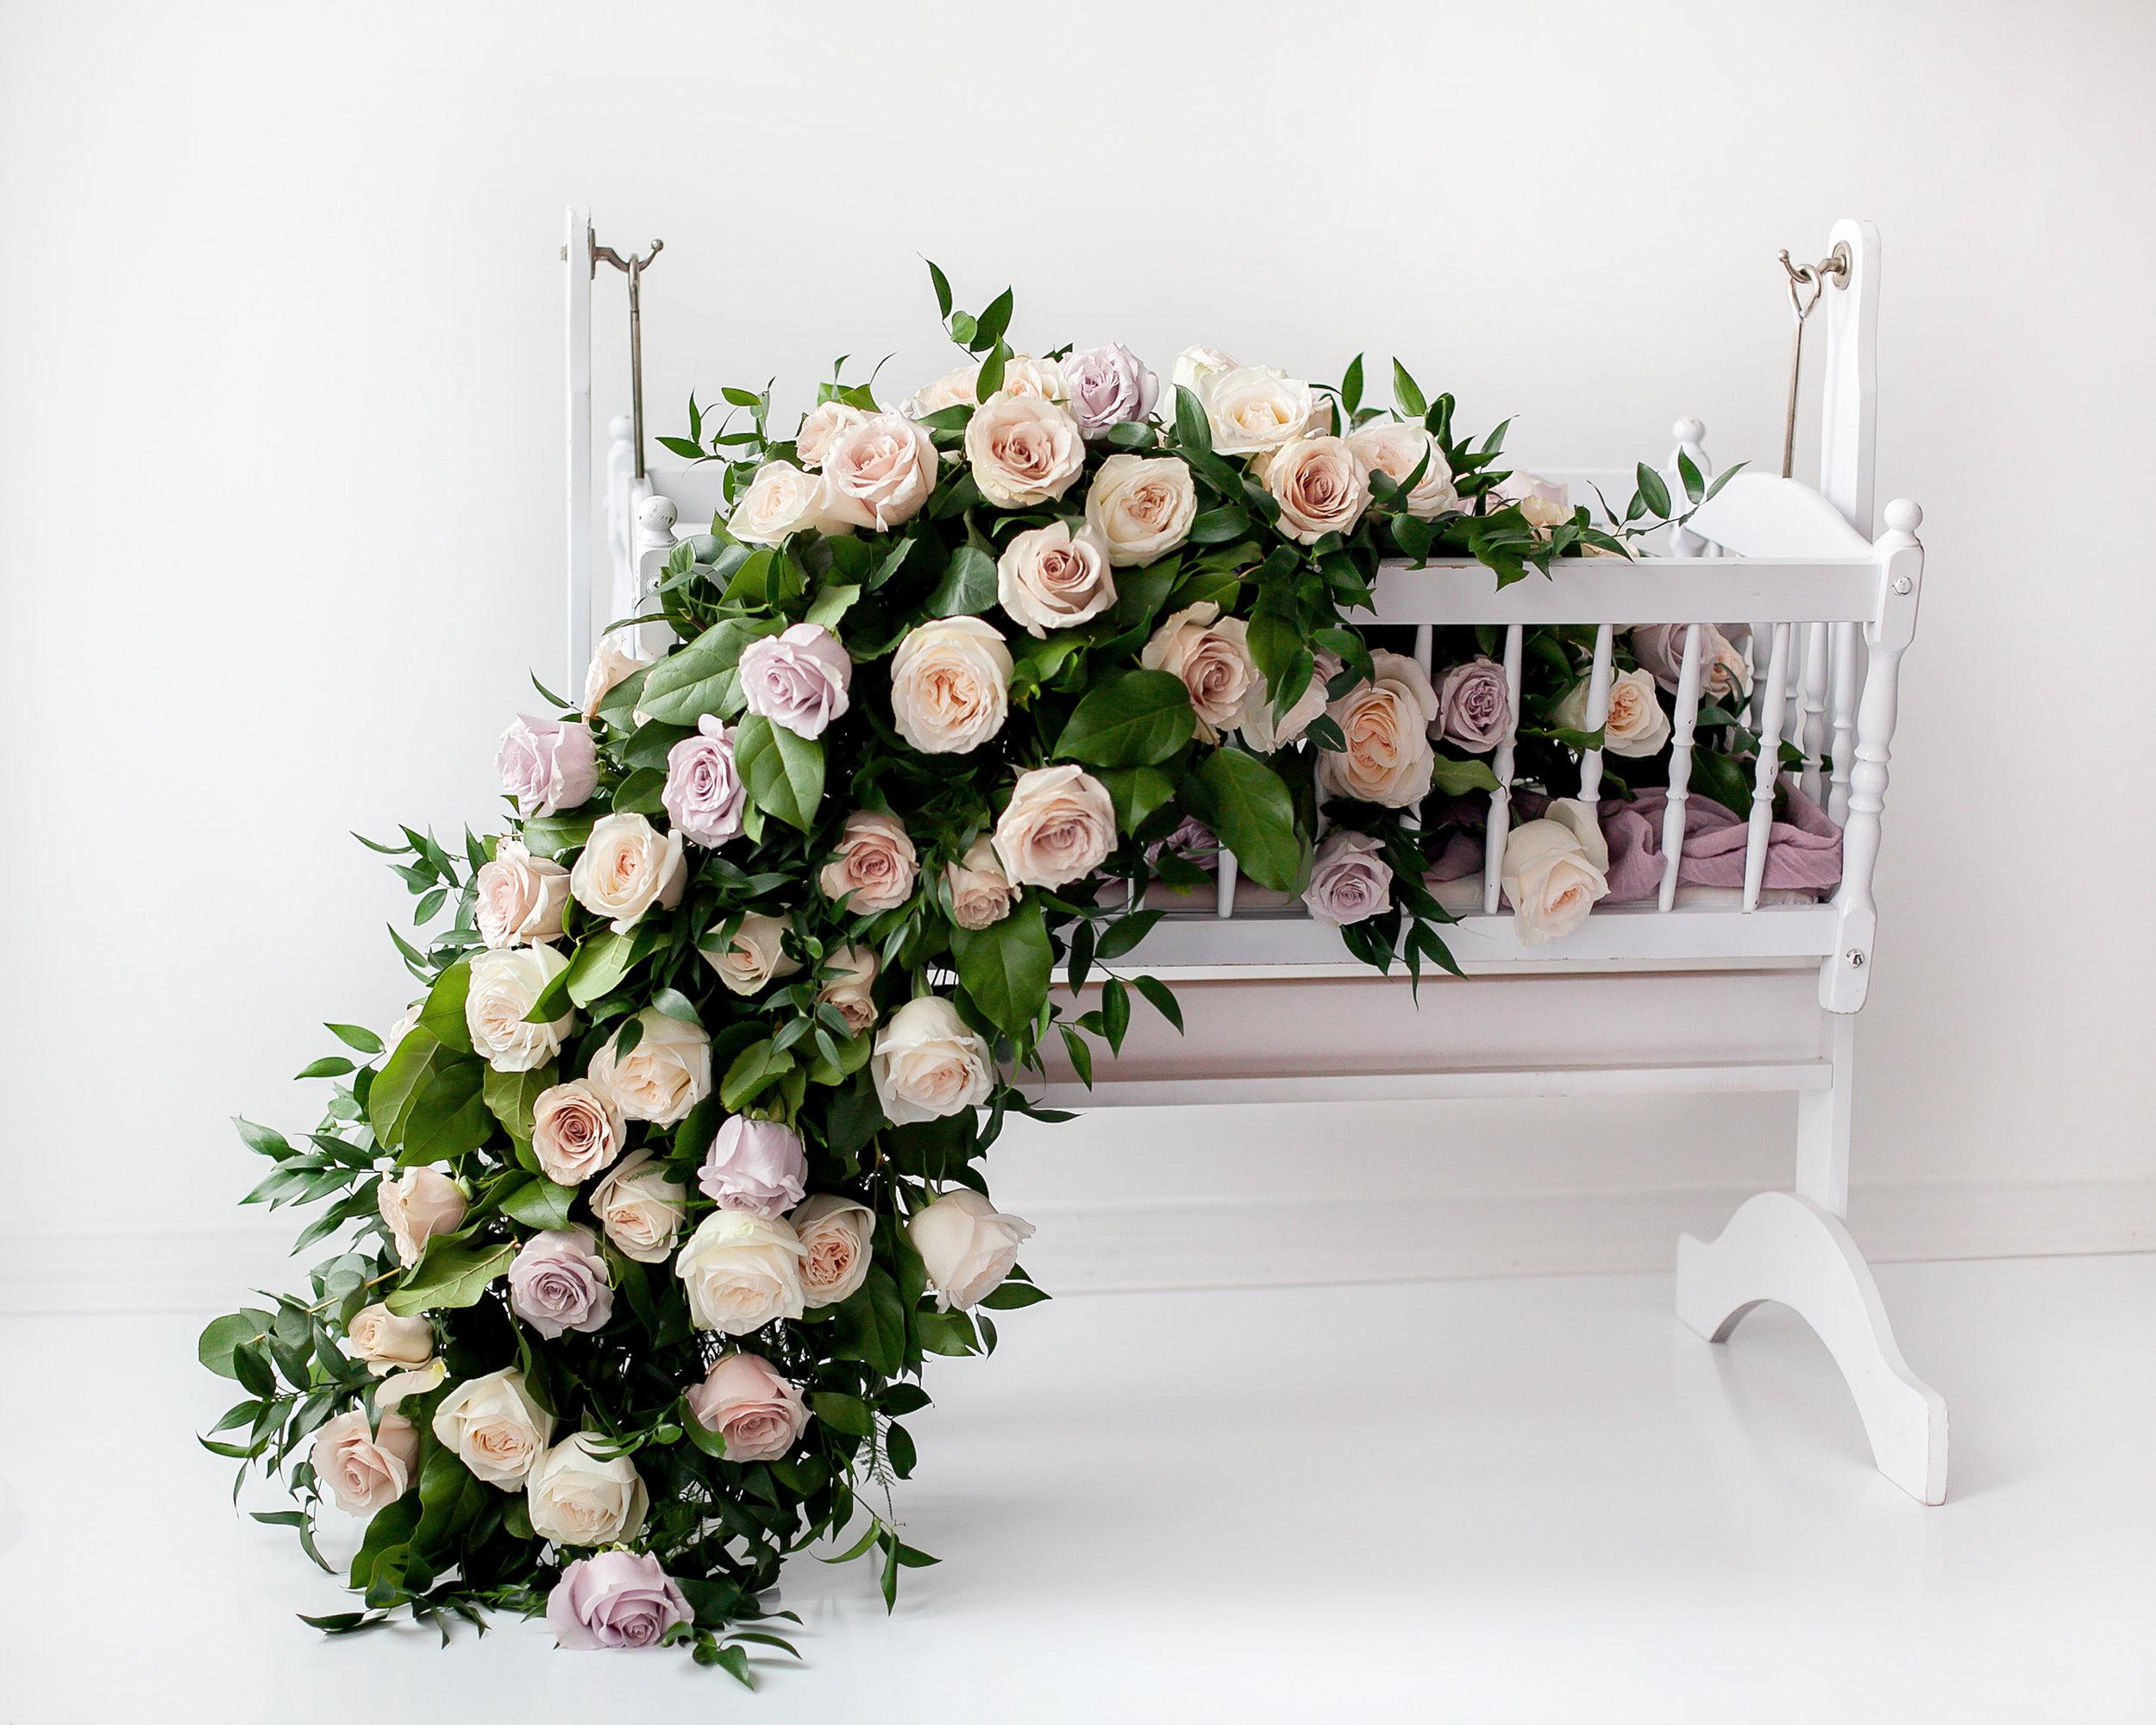 Oshawa_Toronto_GTA_Bowmanville_Maternity_Floral_Photographer_Petra_King_Photography